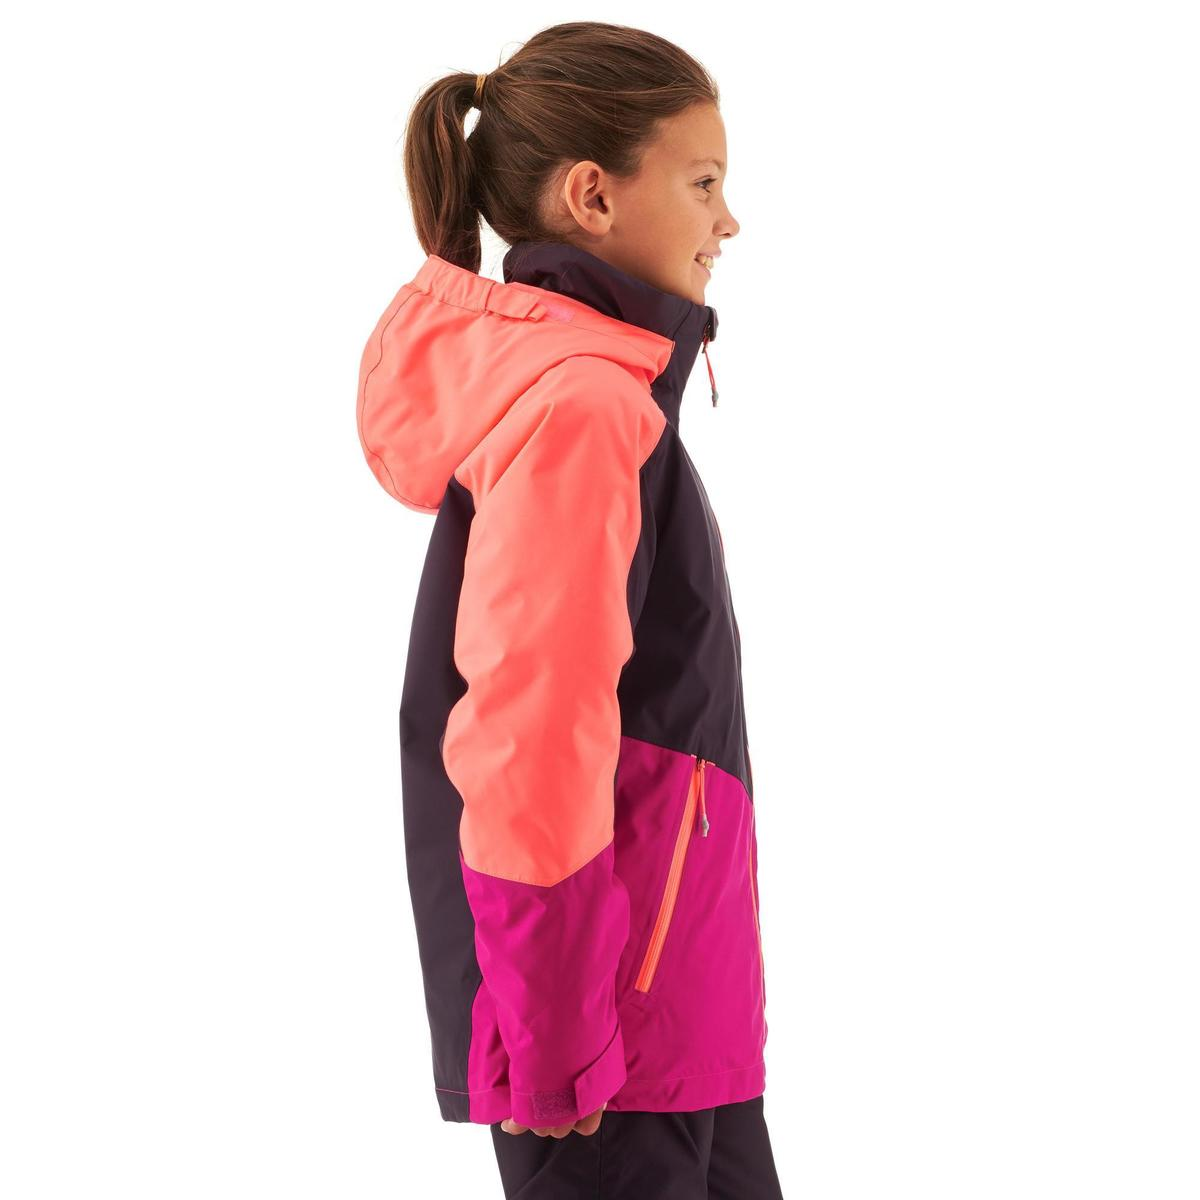 Bild 4 von Skijacke Piste 580 Kinder rosa/violett